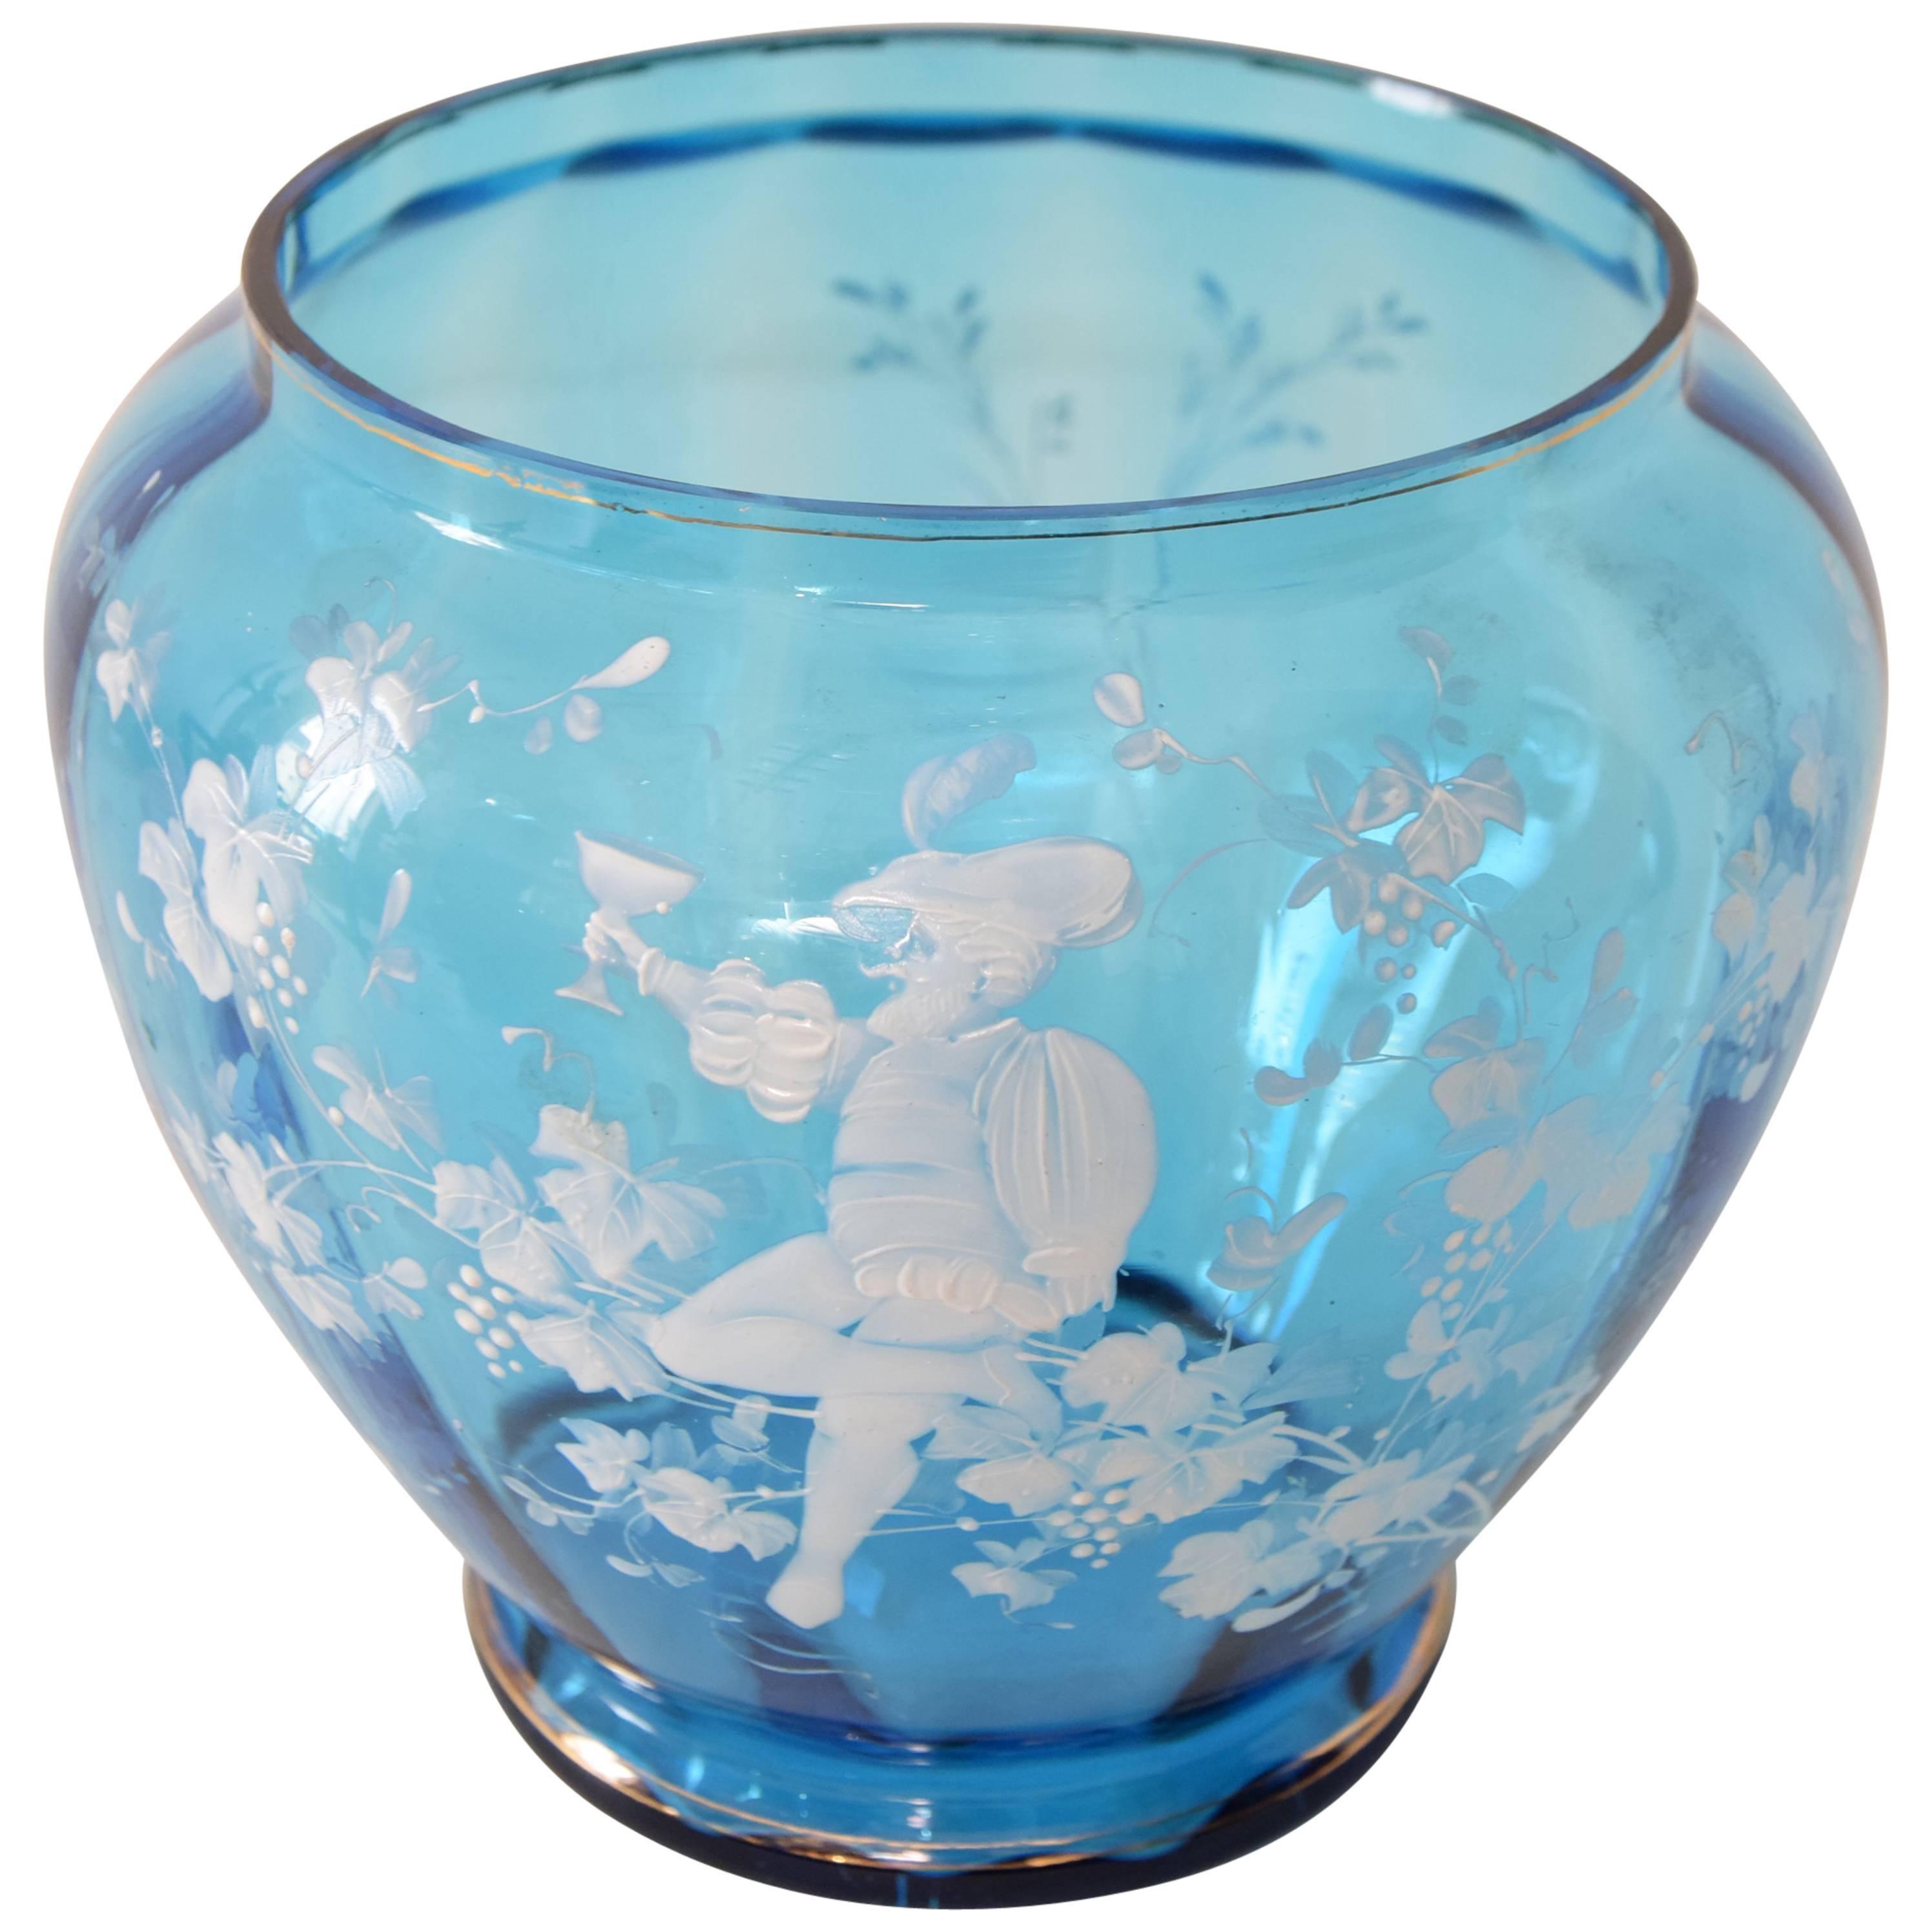 Decorative Glass Vase, circa 1920s